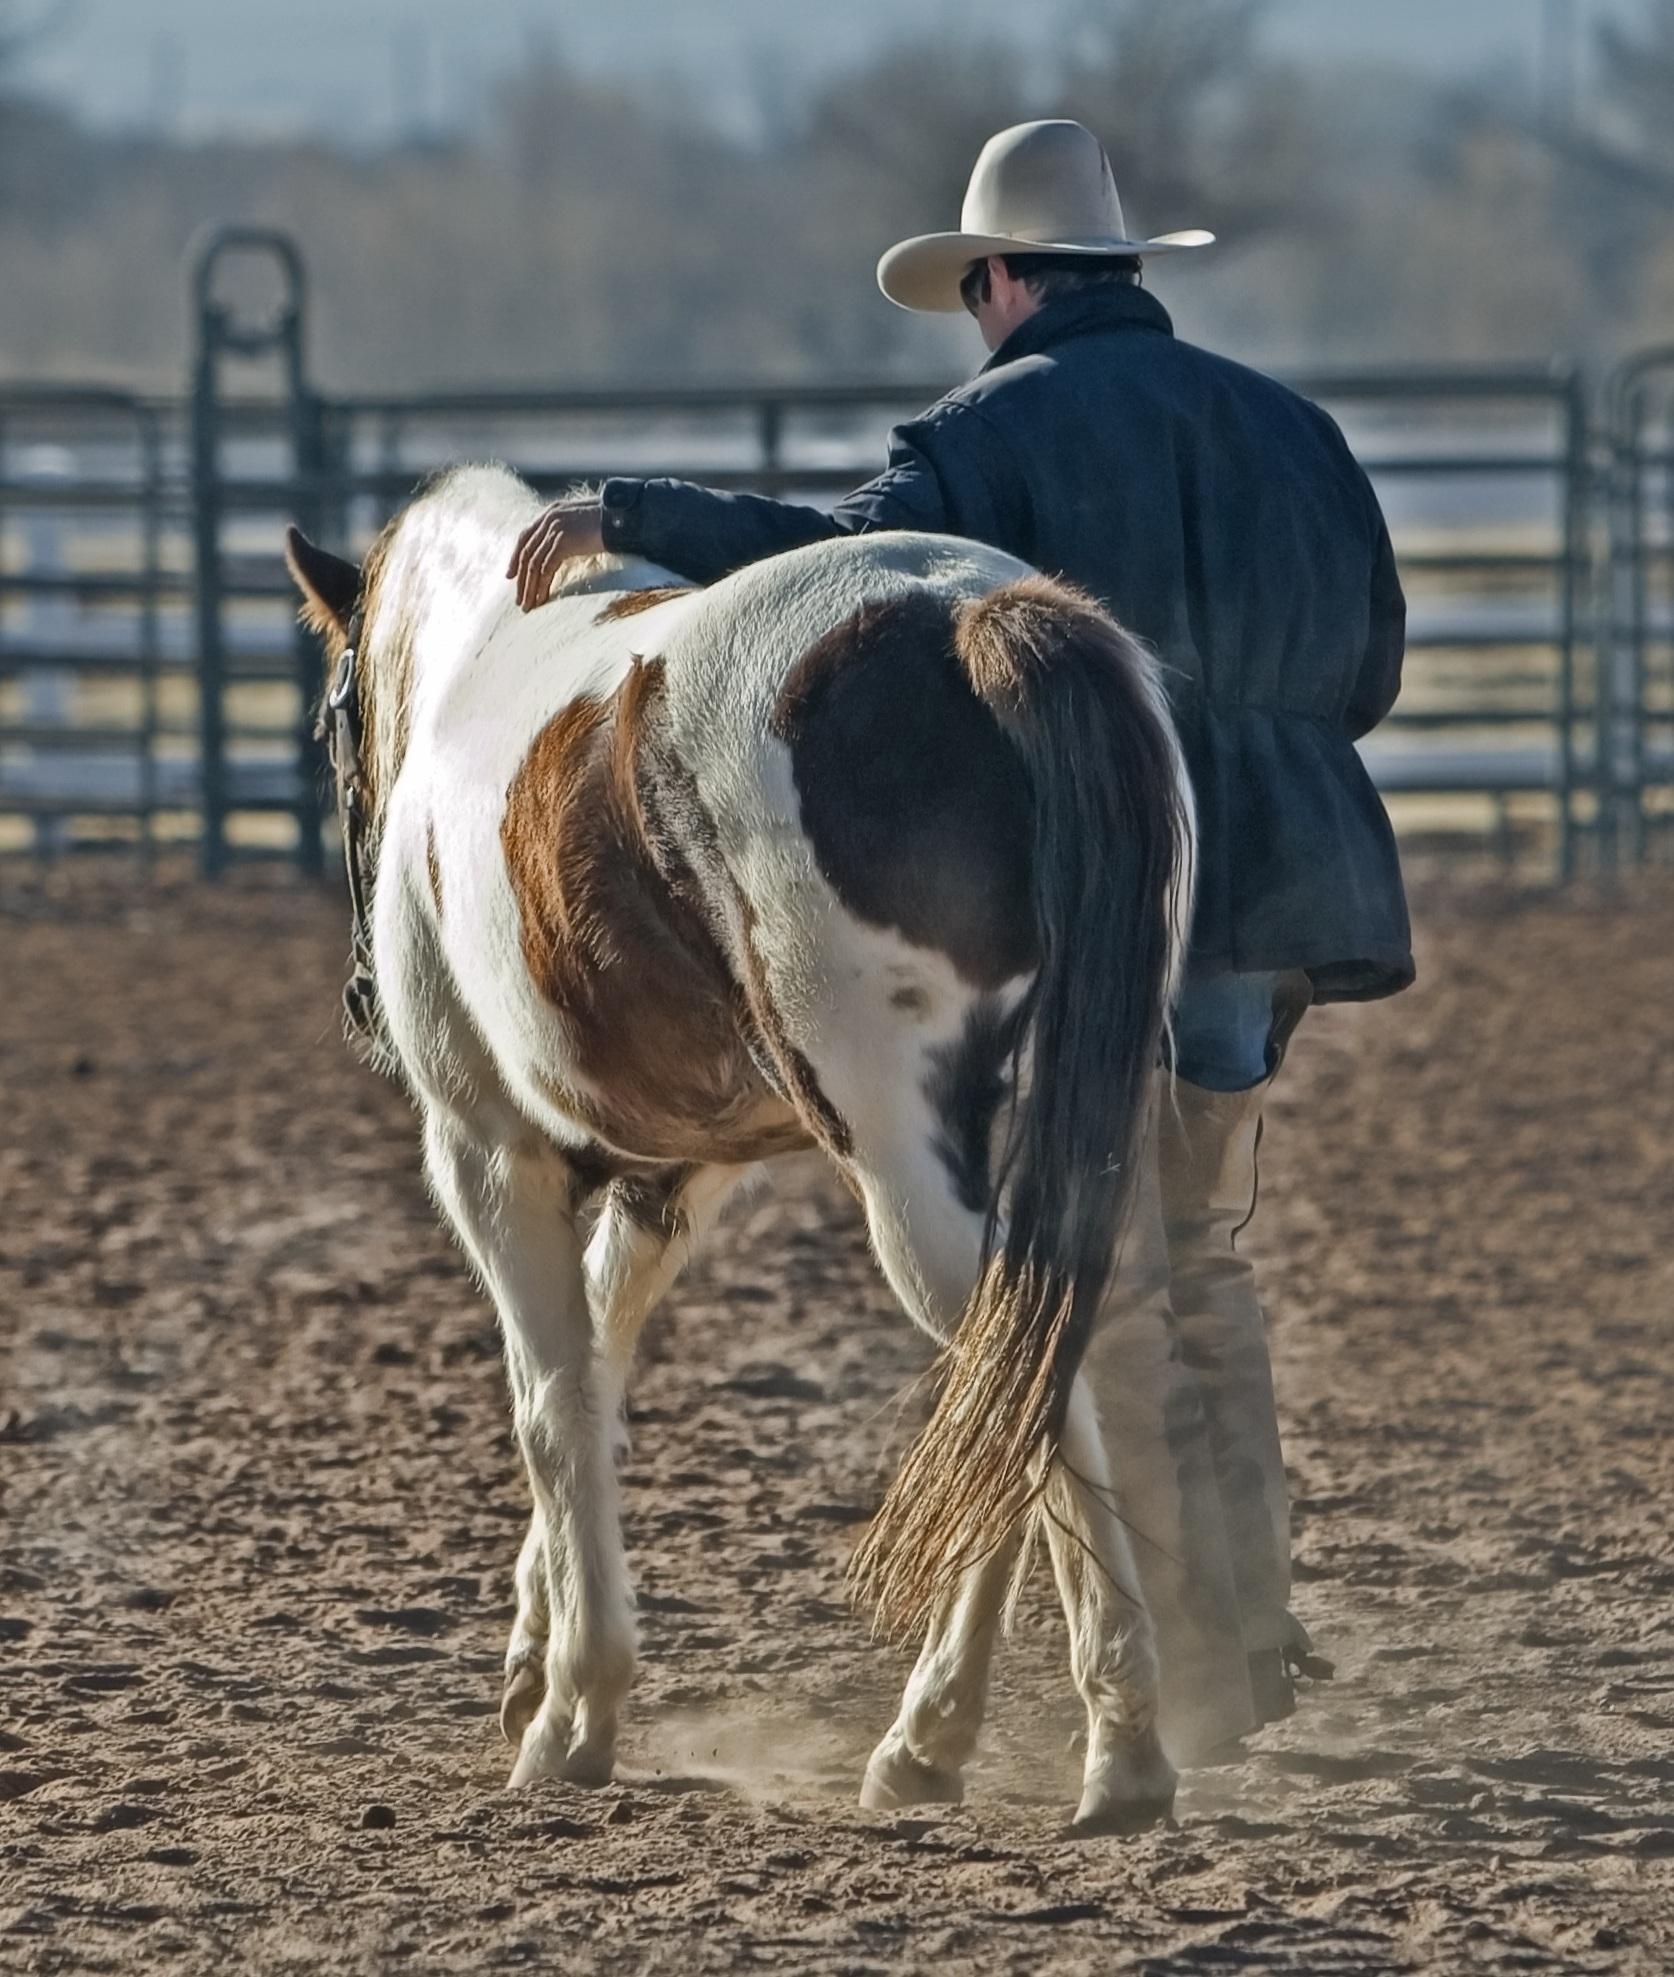 cowboy-horse-pony-western-53011.jpeg